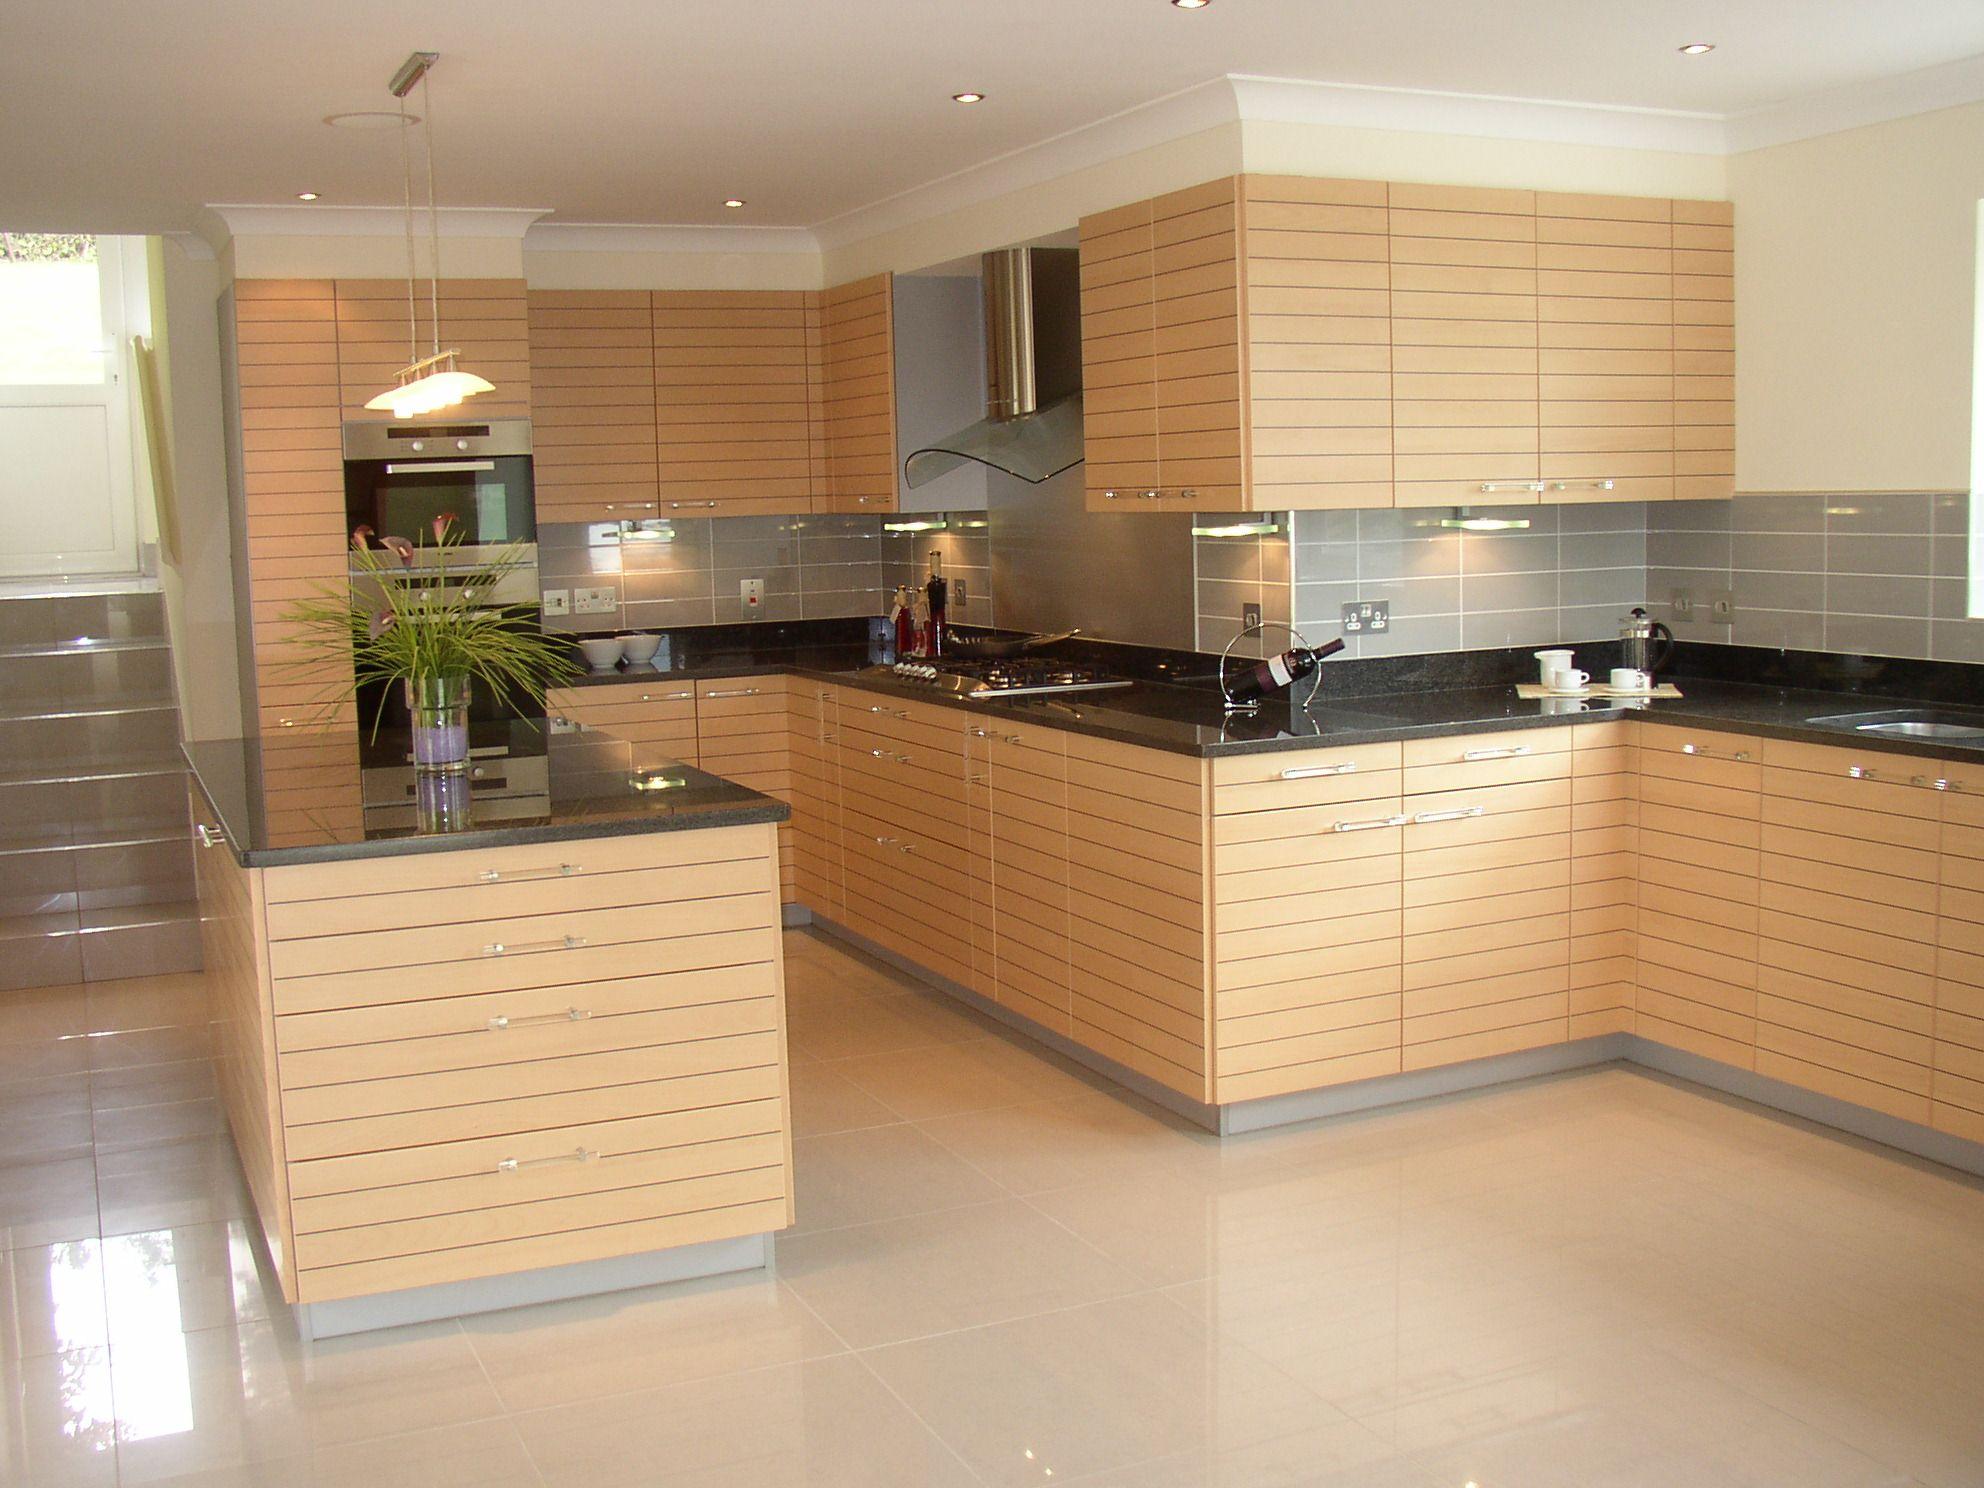 Al al alno kitchen cabinets chicago - Alno Line Kitchen